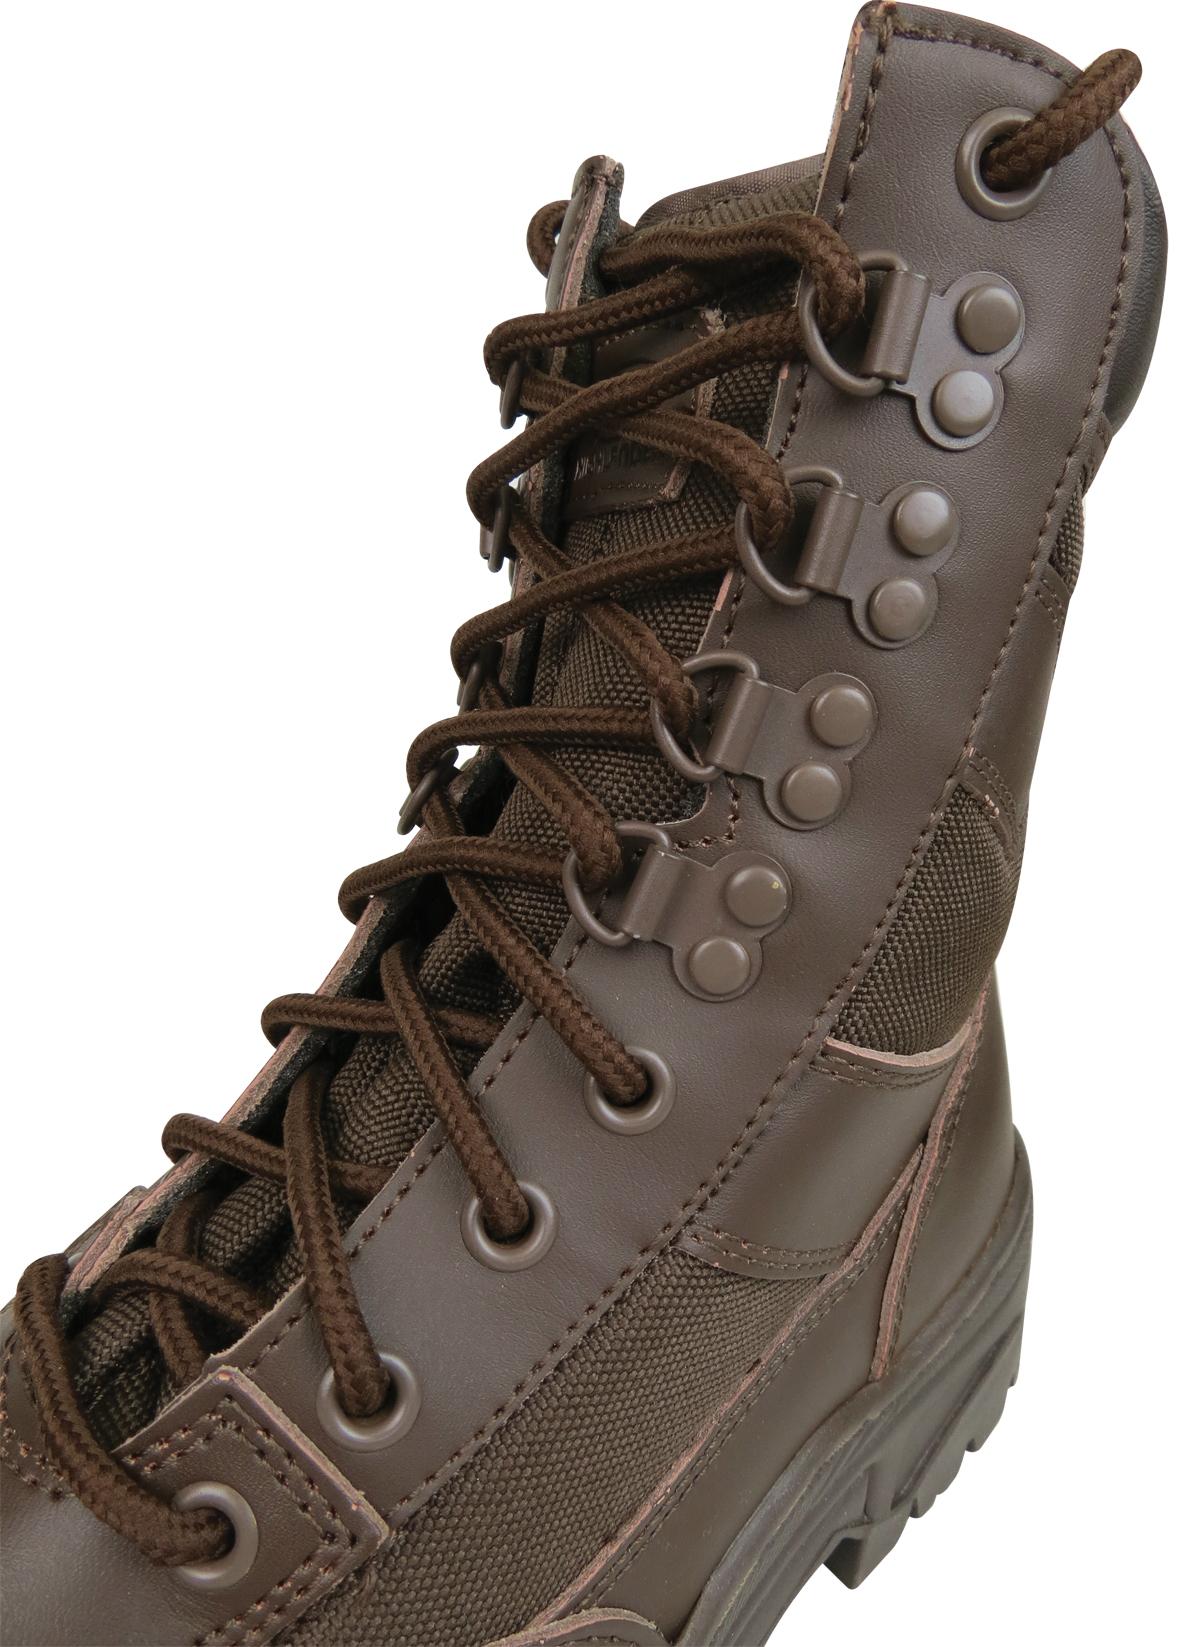 7e06e52a2ee Patrol Boots (Cadet Style)